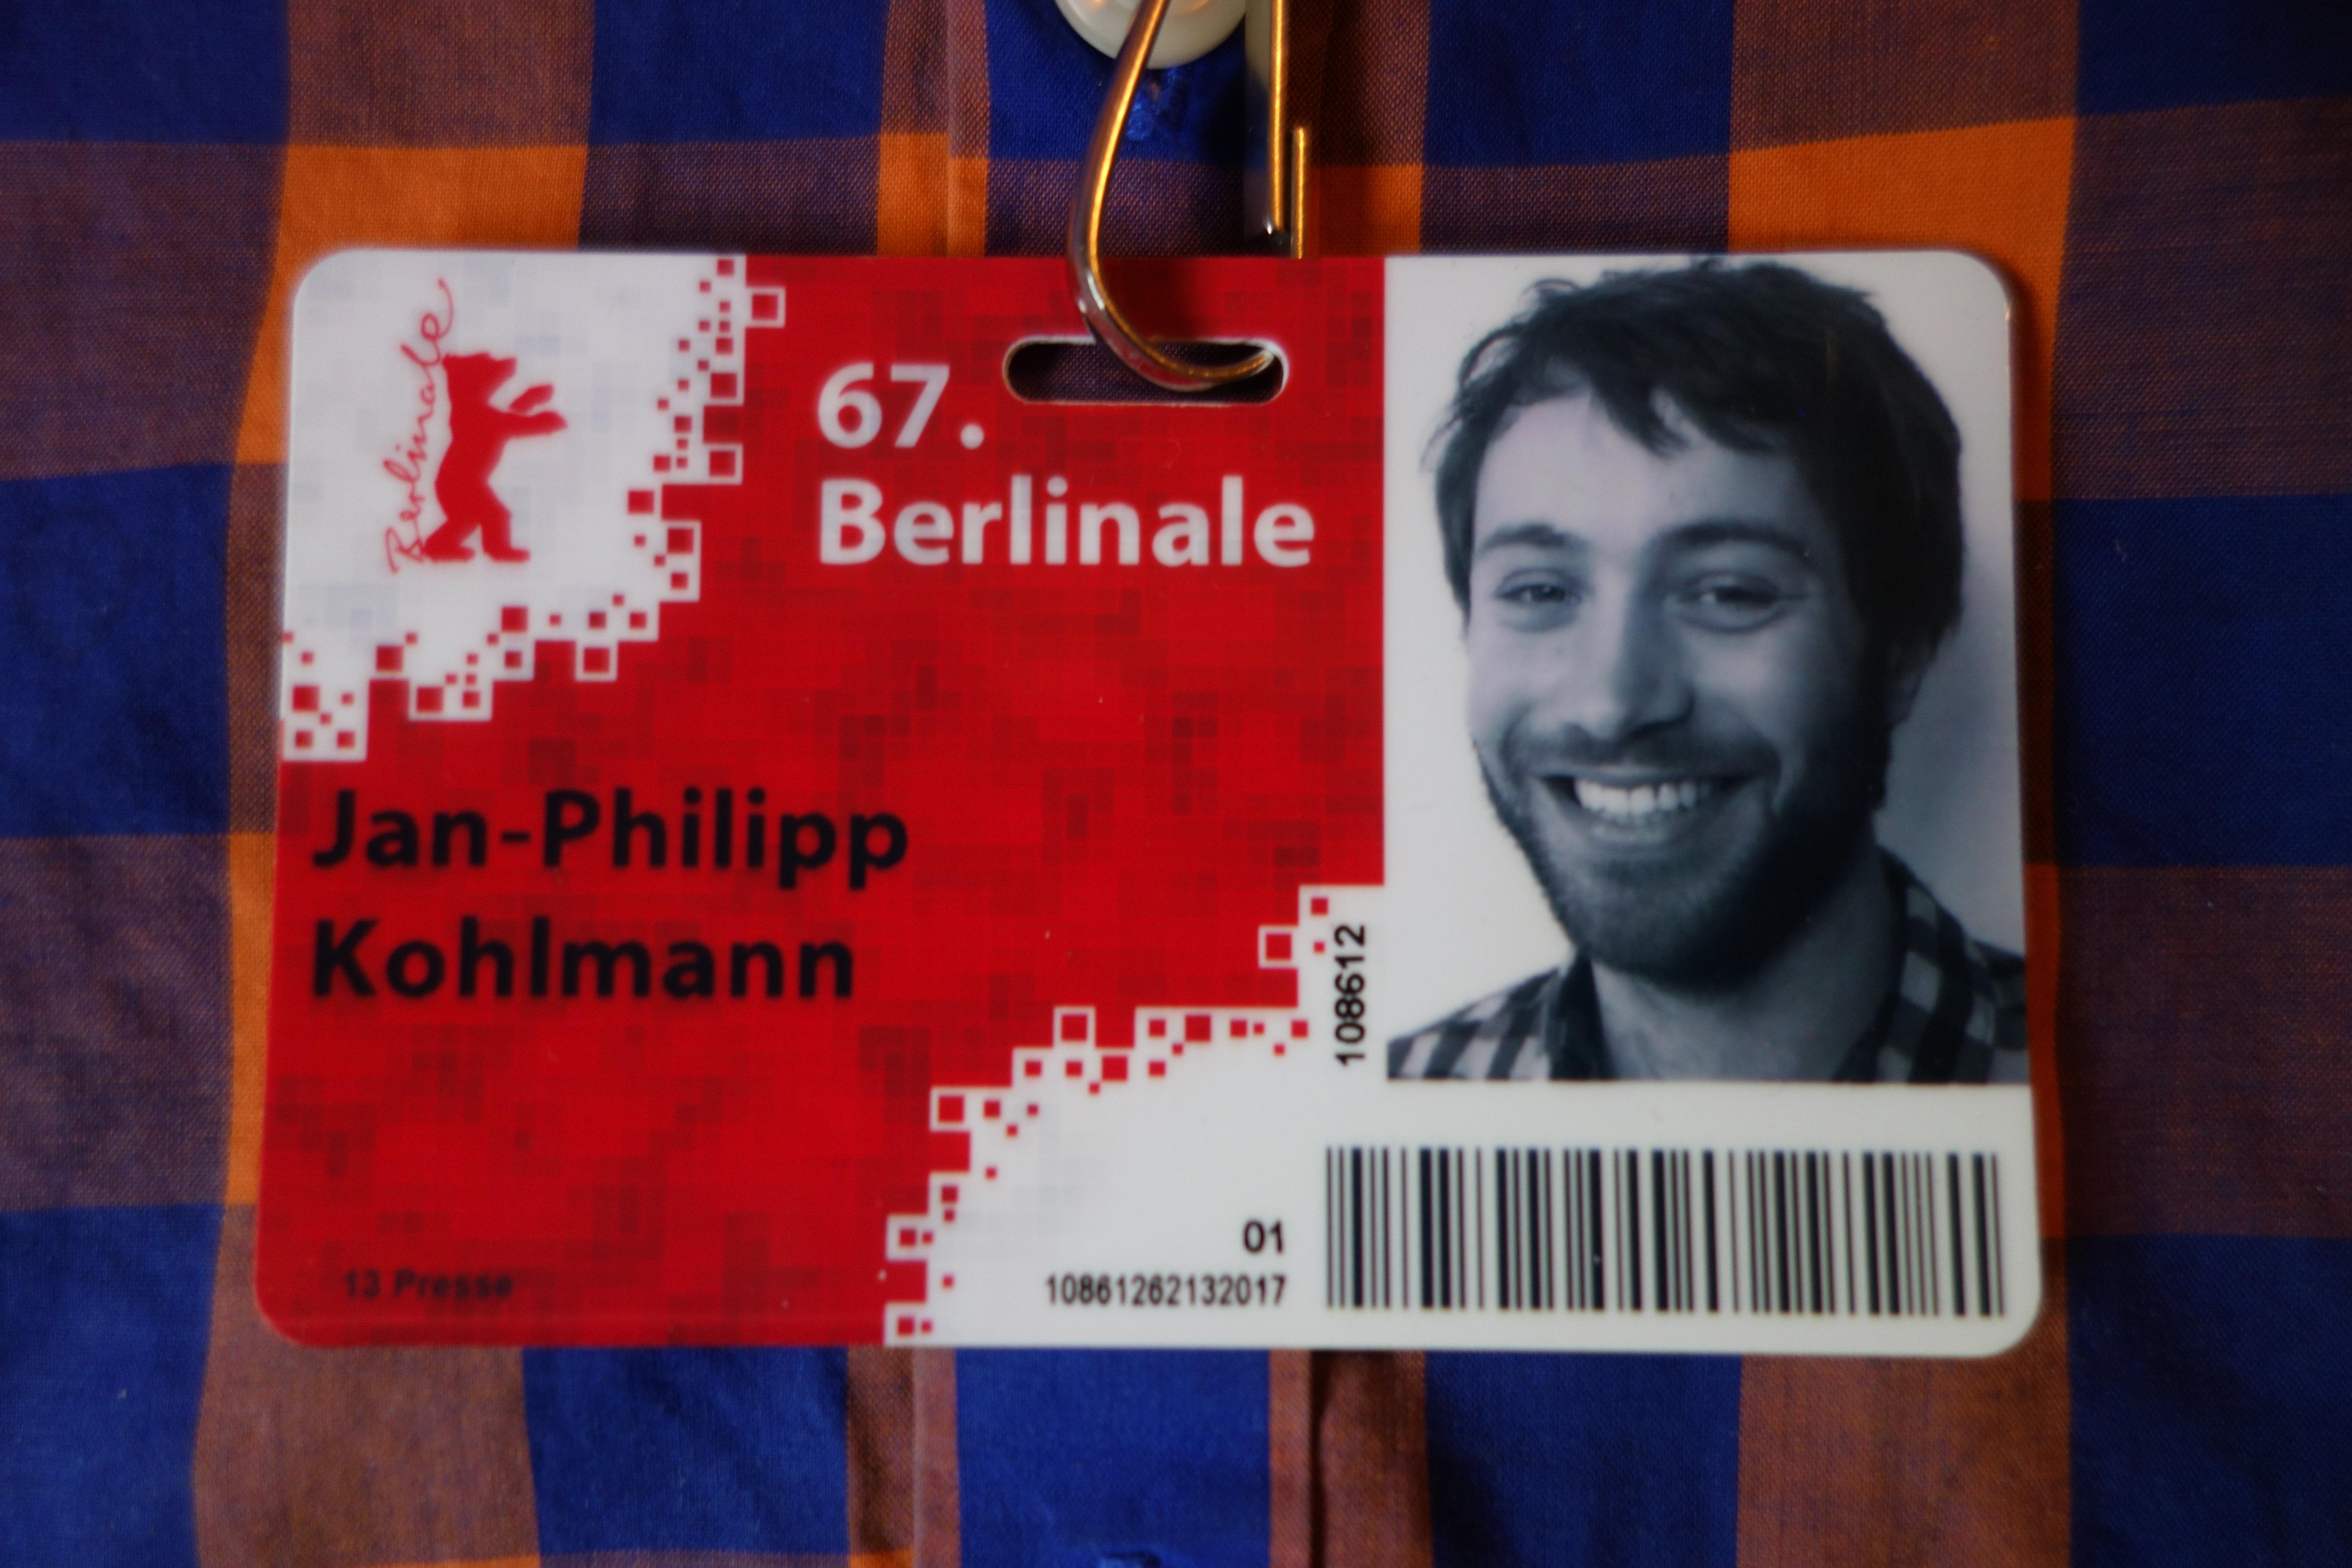 Berlinale-Blogger Jan-Philipp Kohlmann